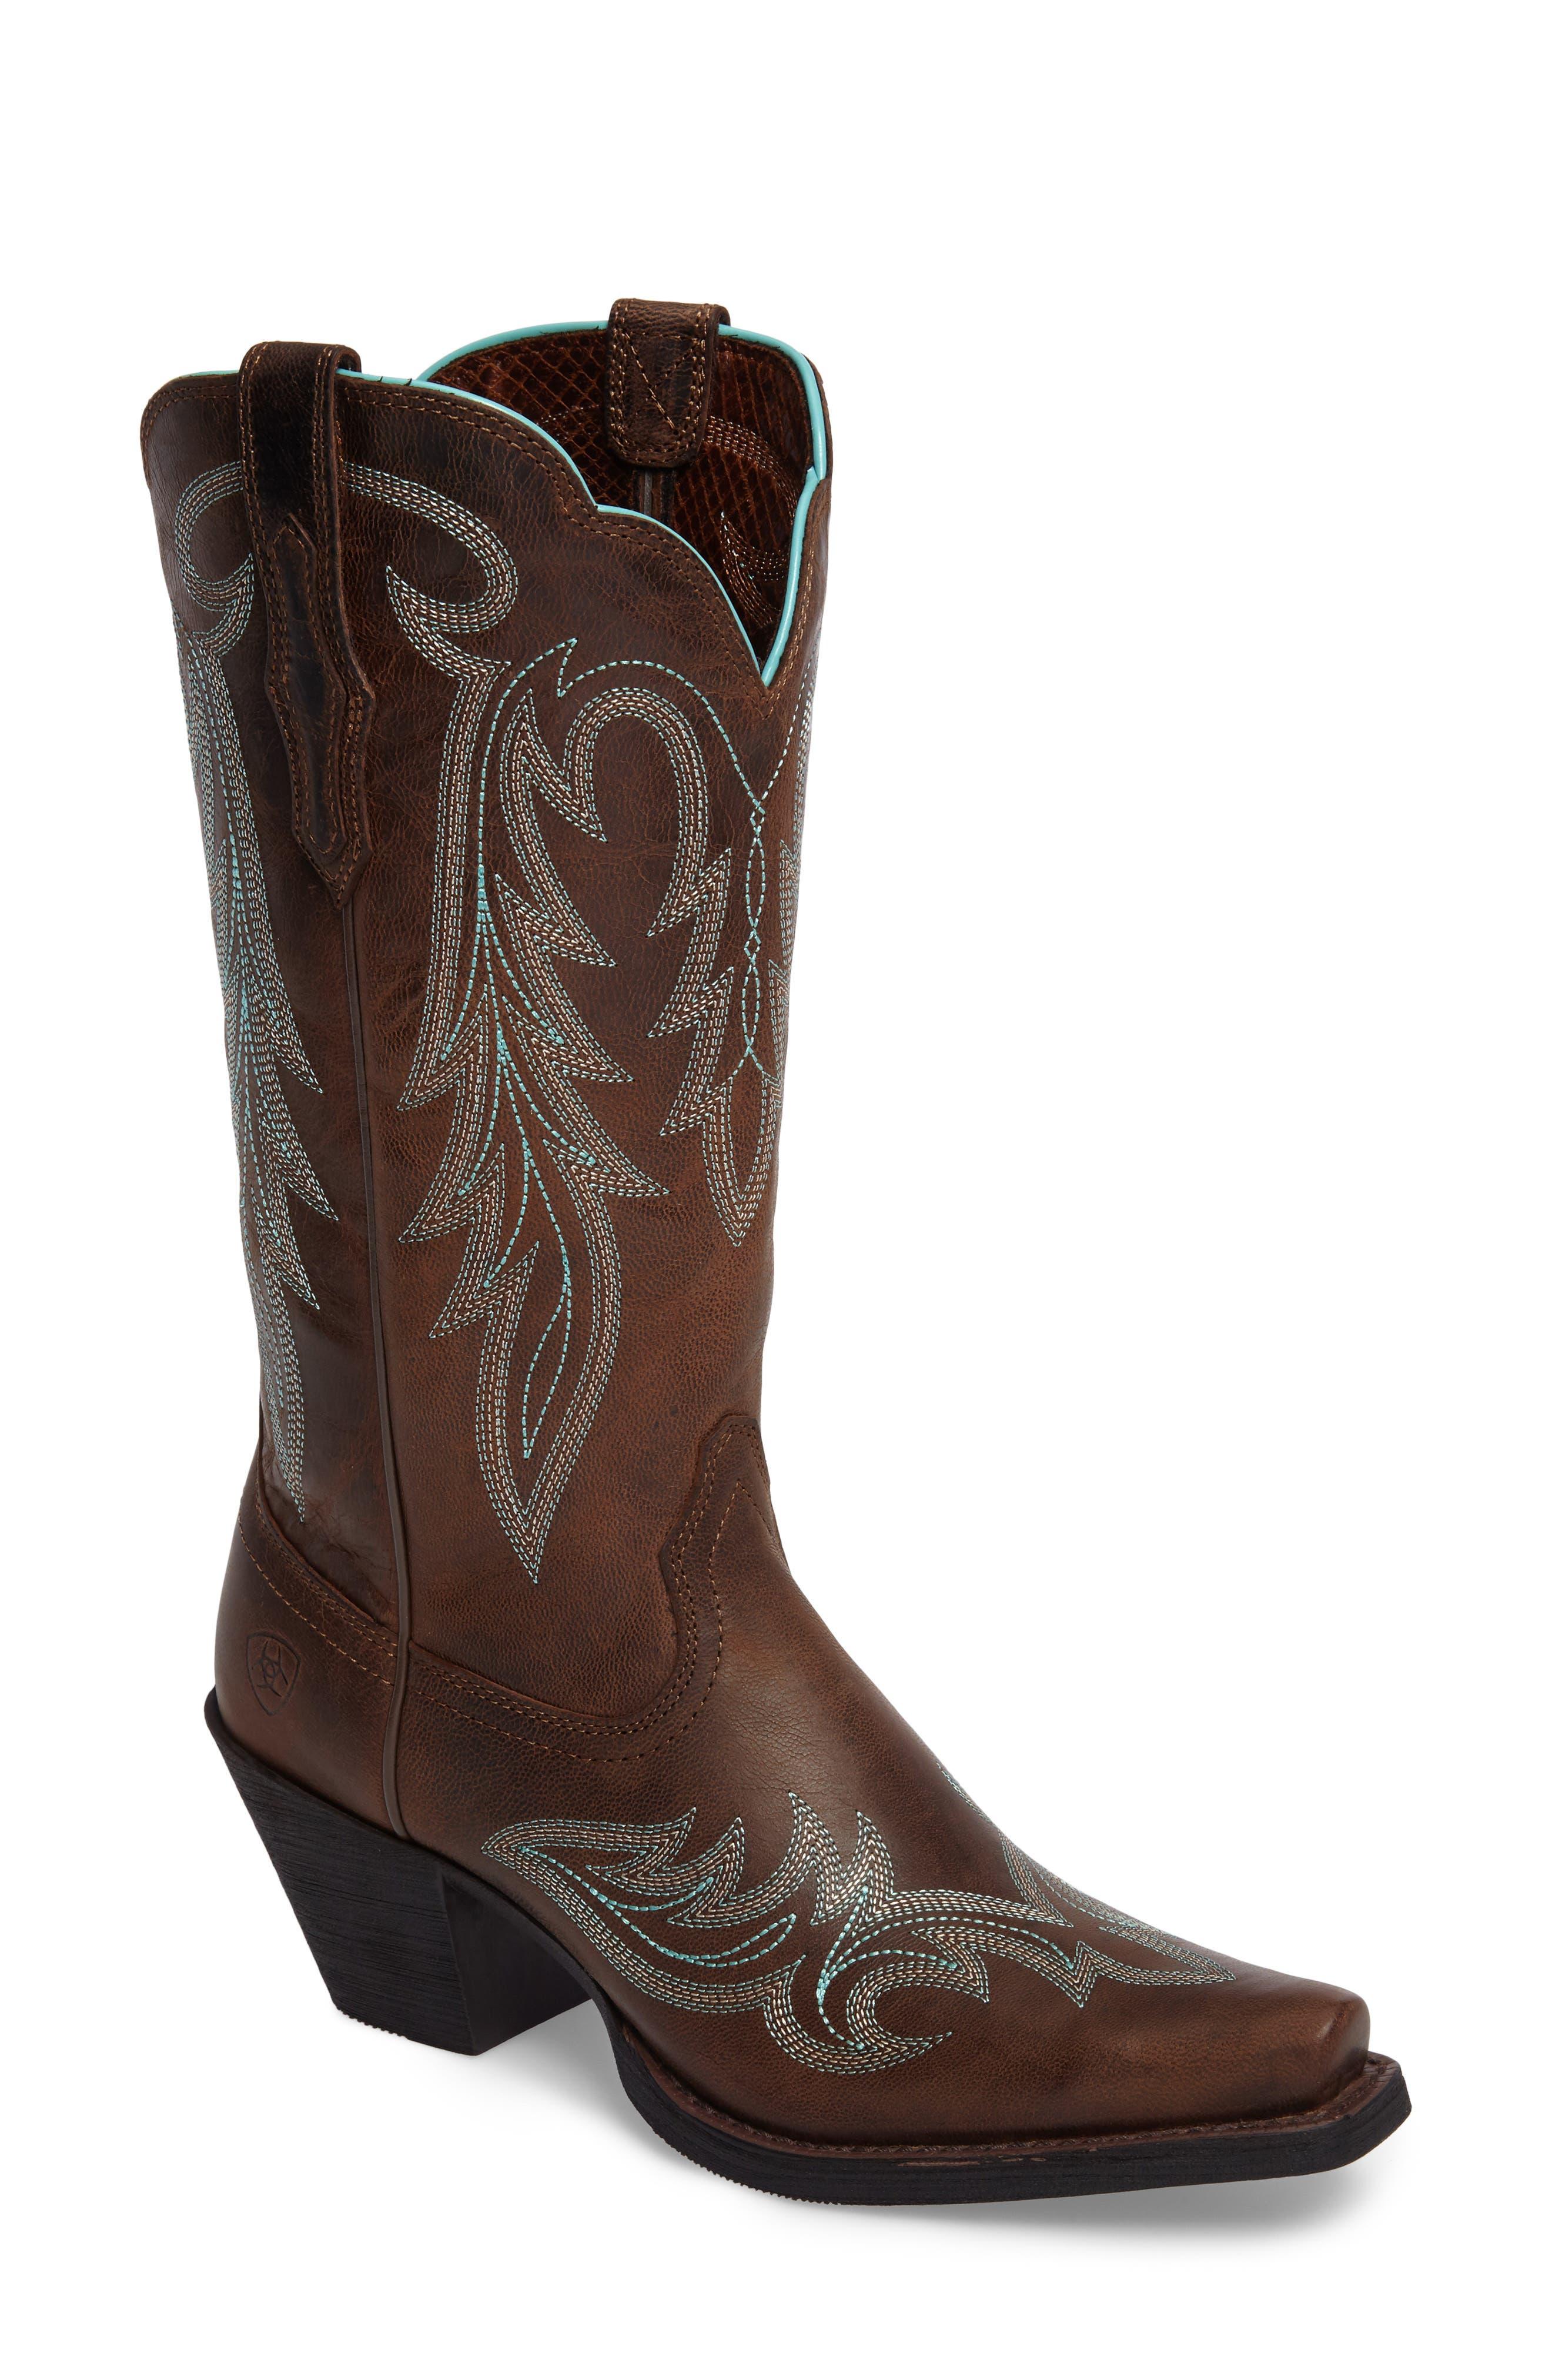 Main Image - Ariat Round Up Renegade Western Boot (Women)